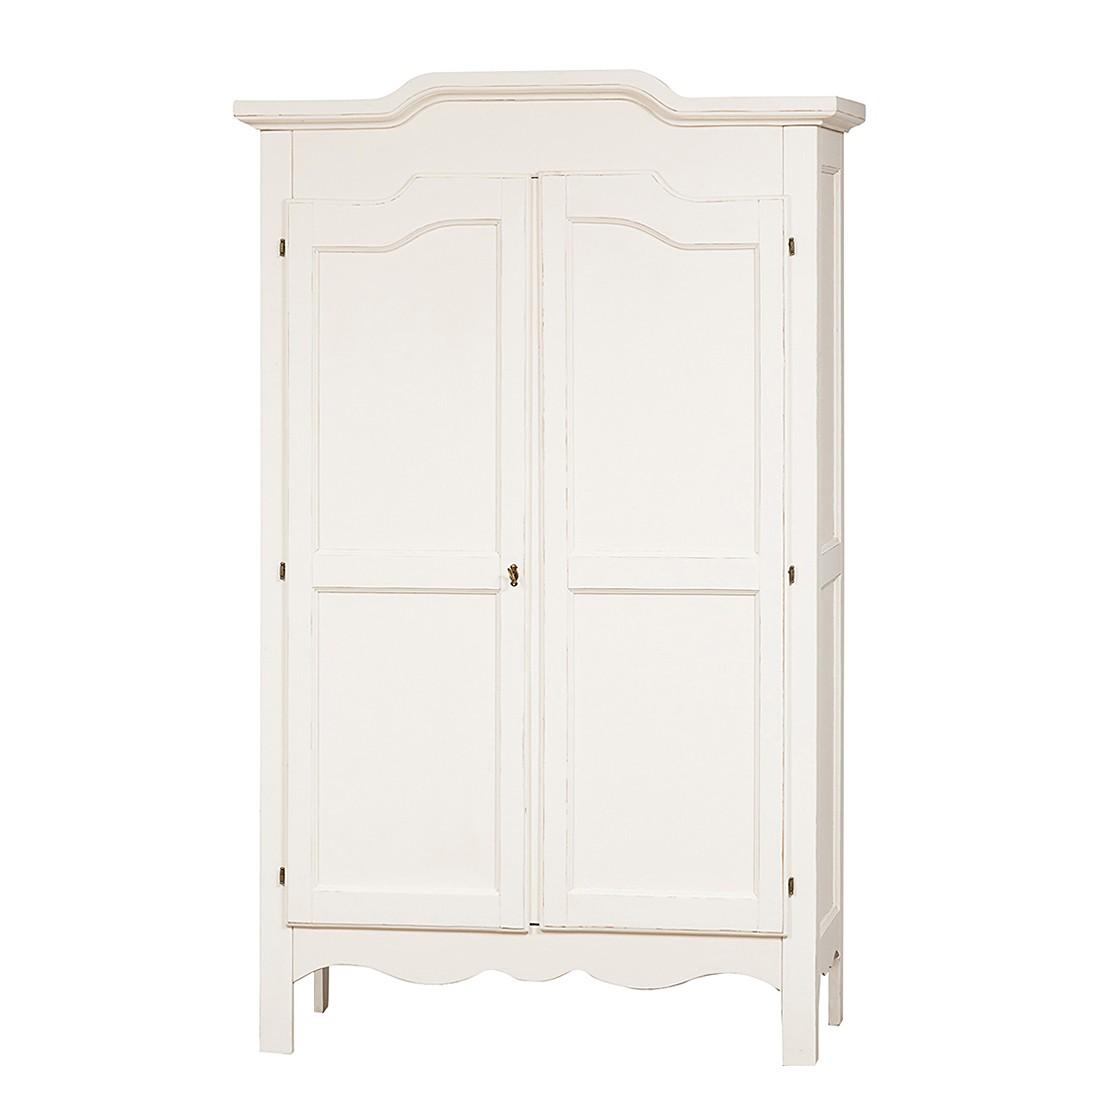 armoire v tements giocoso i tilleul massif blanc. Black Bedroom Furniture Sets. Home Design Ideas